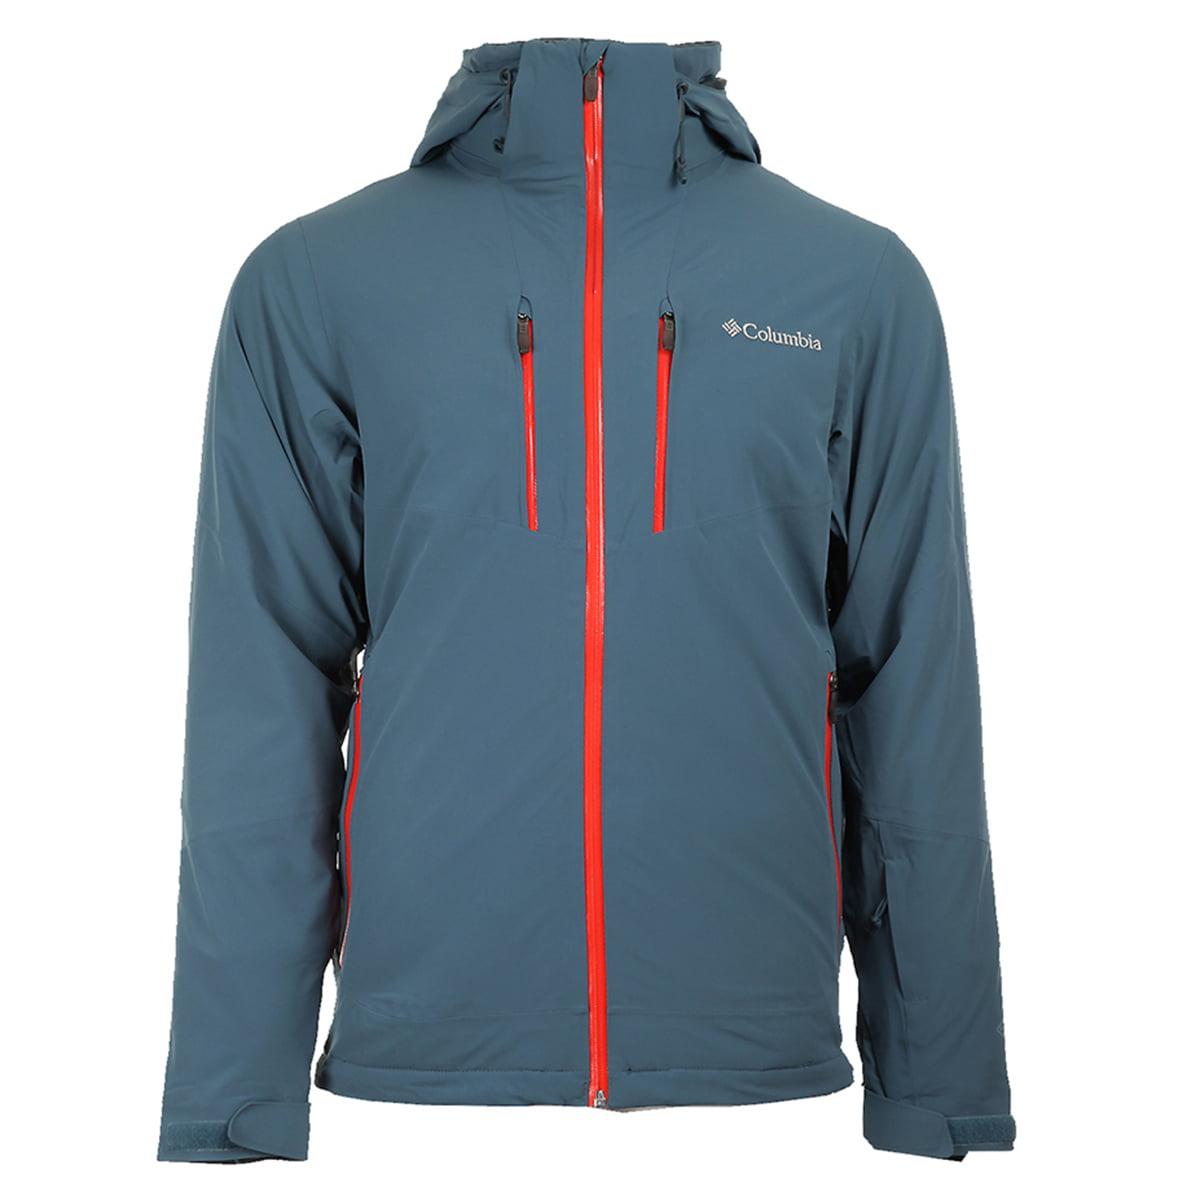 Columbia Men's Millennium Blur Jacket 1625042429 Everblue